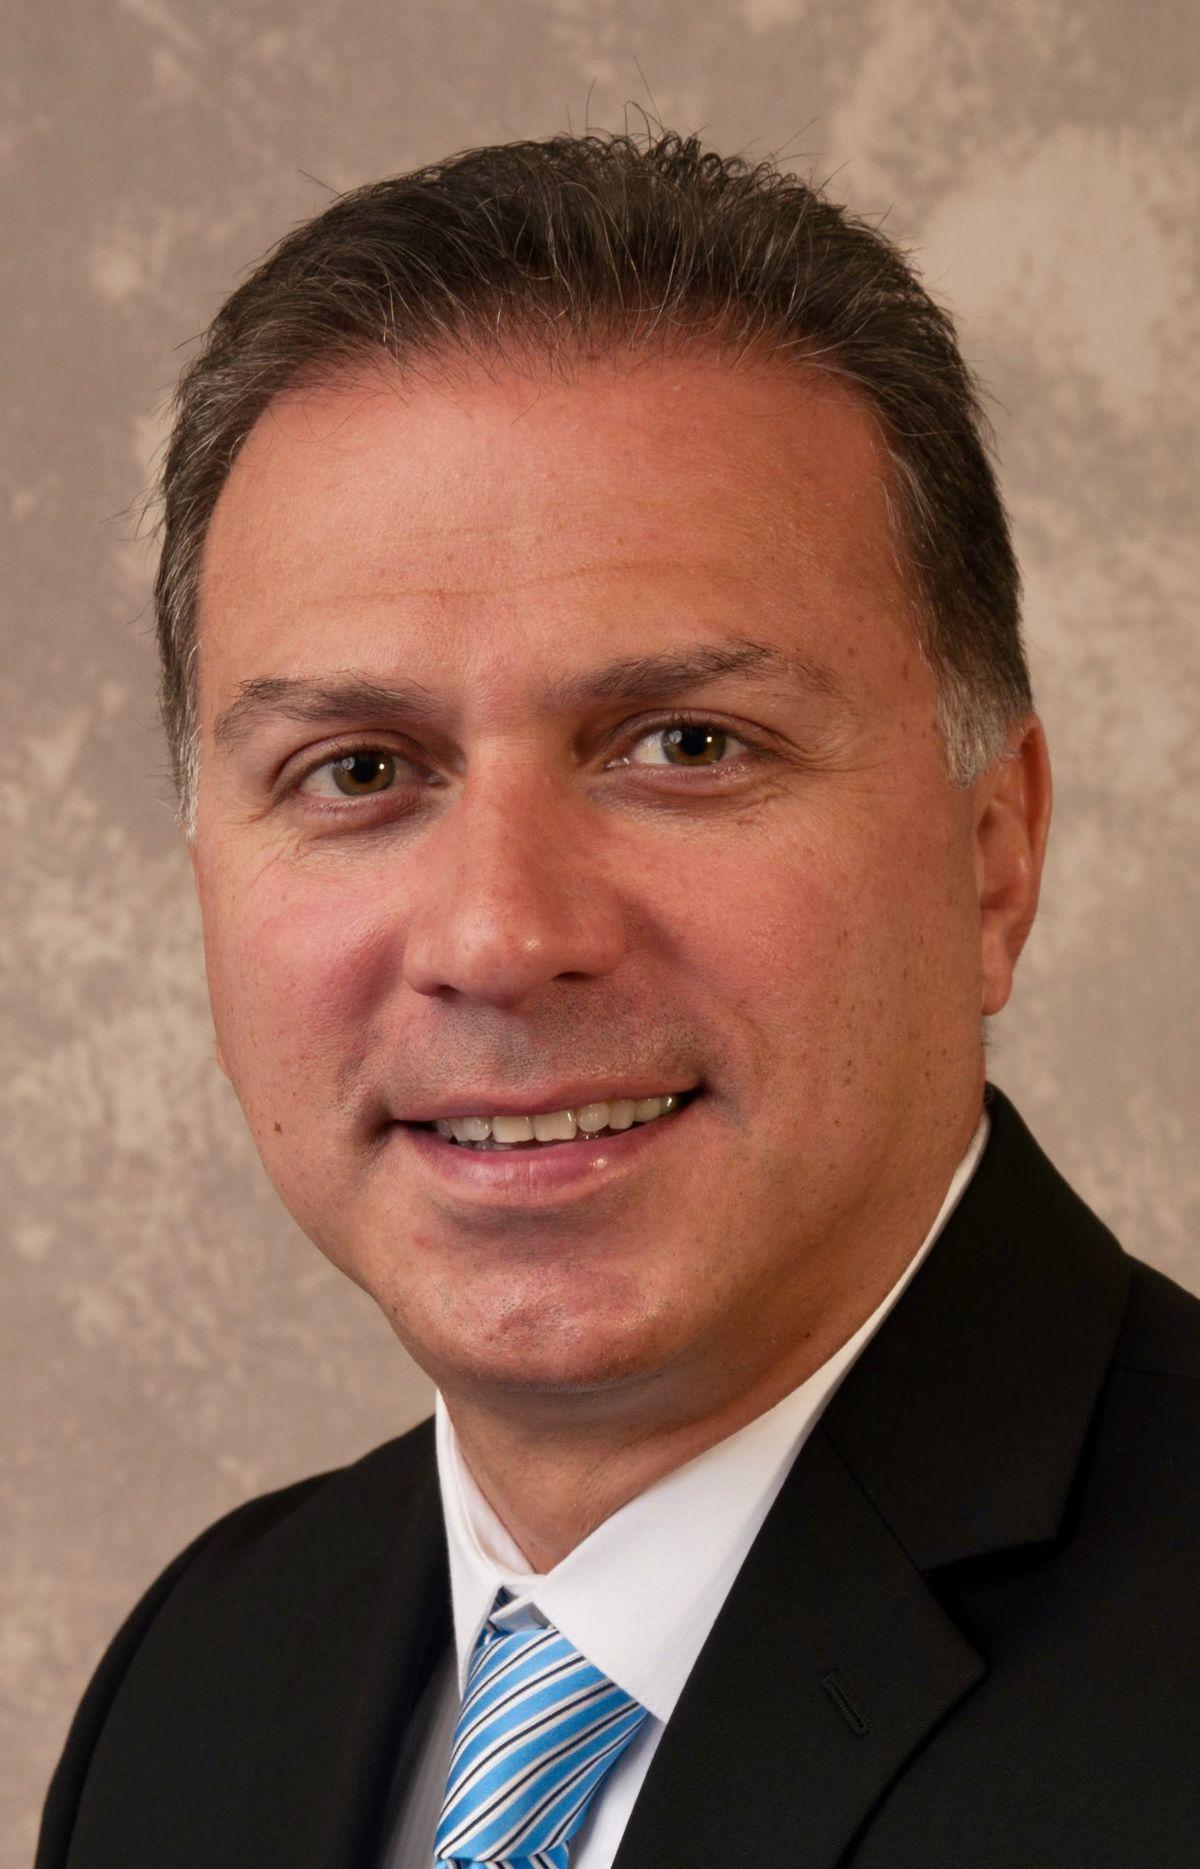 Zing Health brings in Mete Sahin as Chief Financial Officer, Zing Health